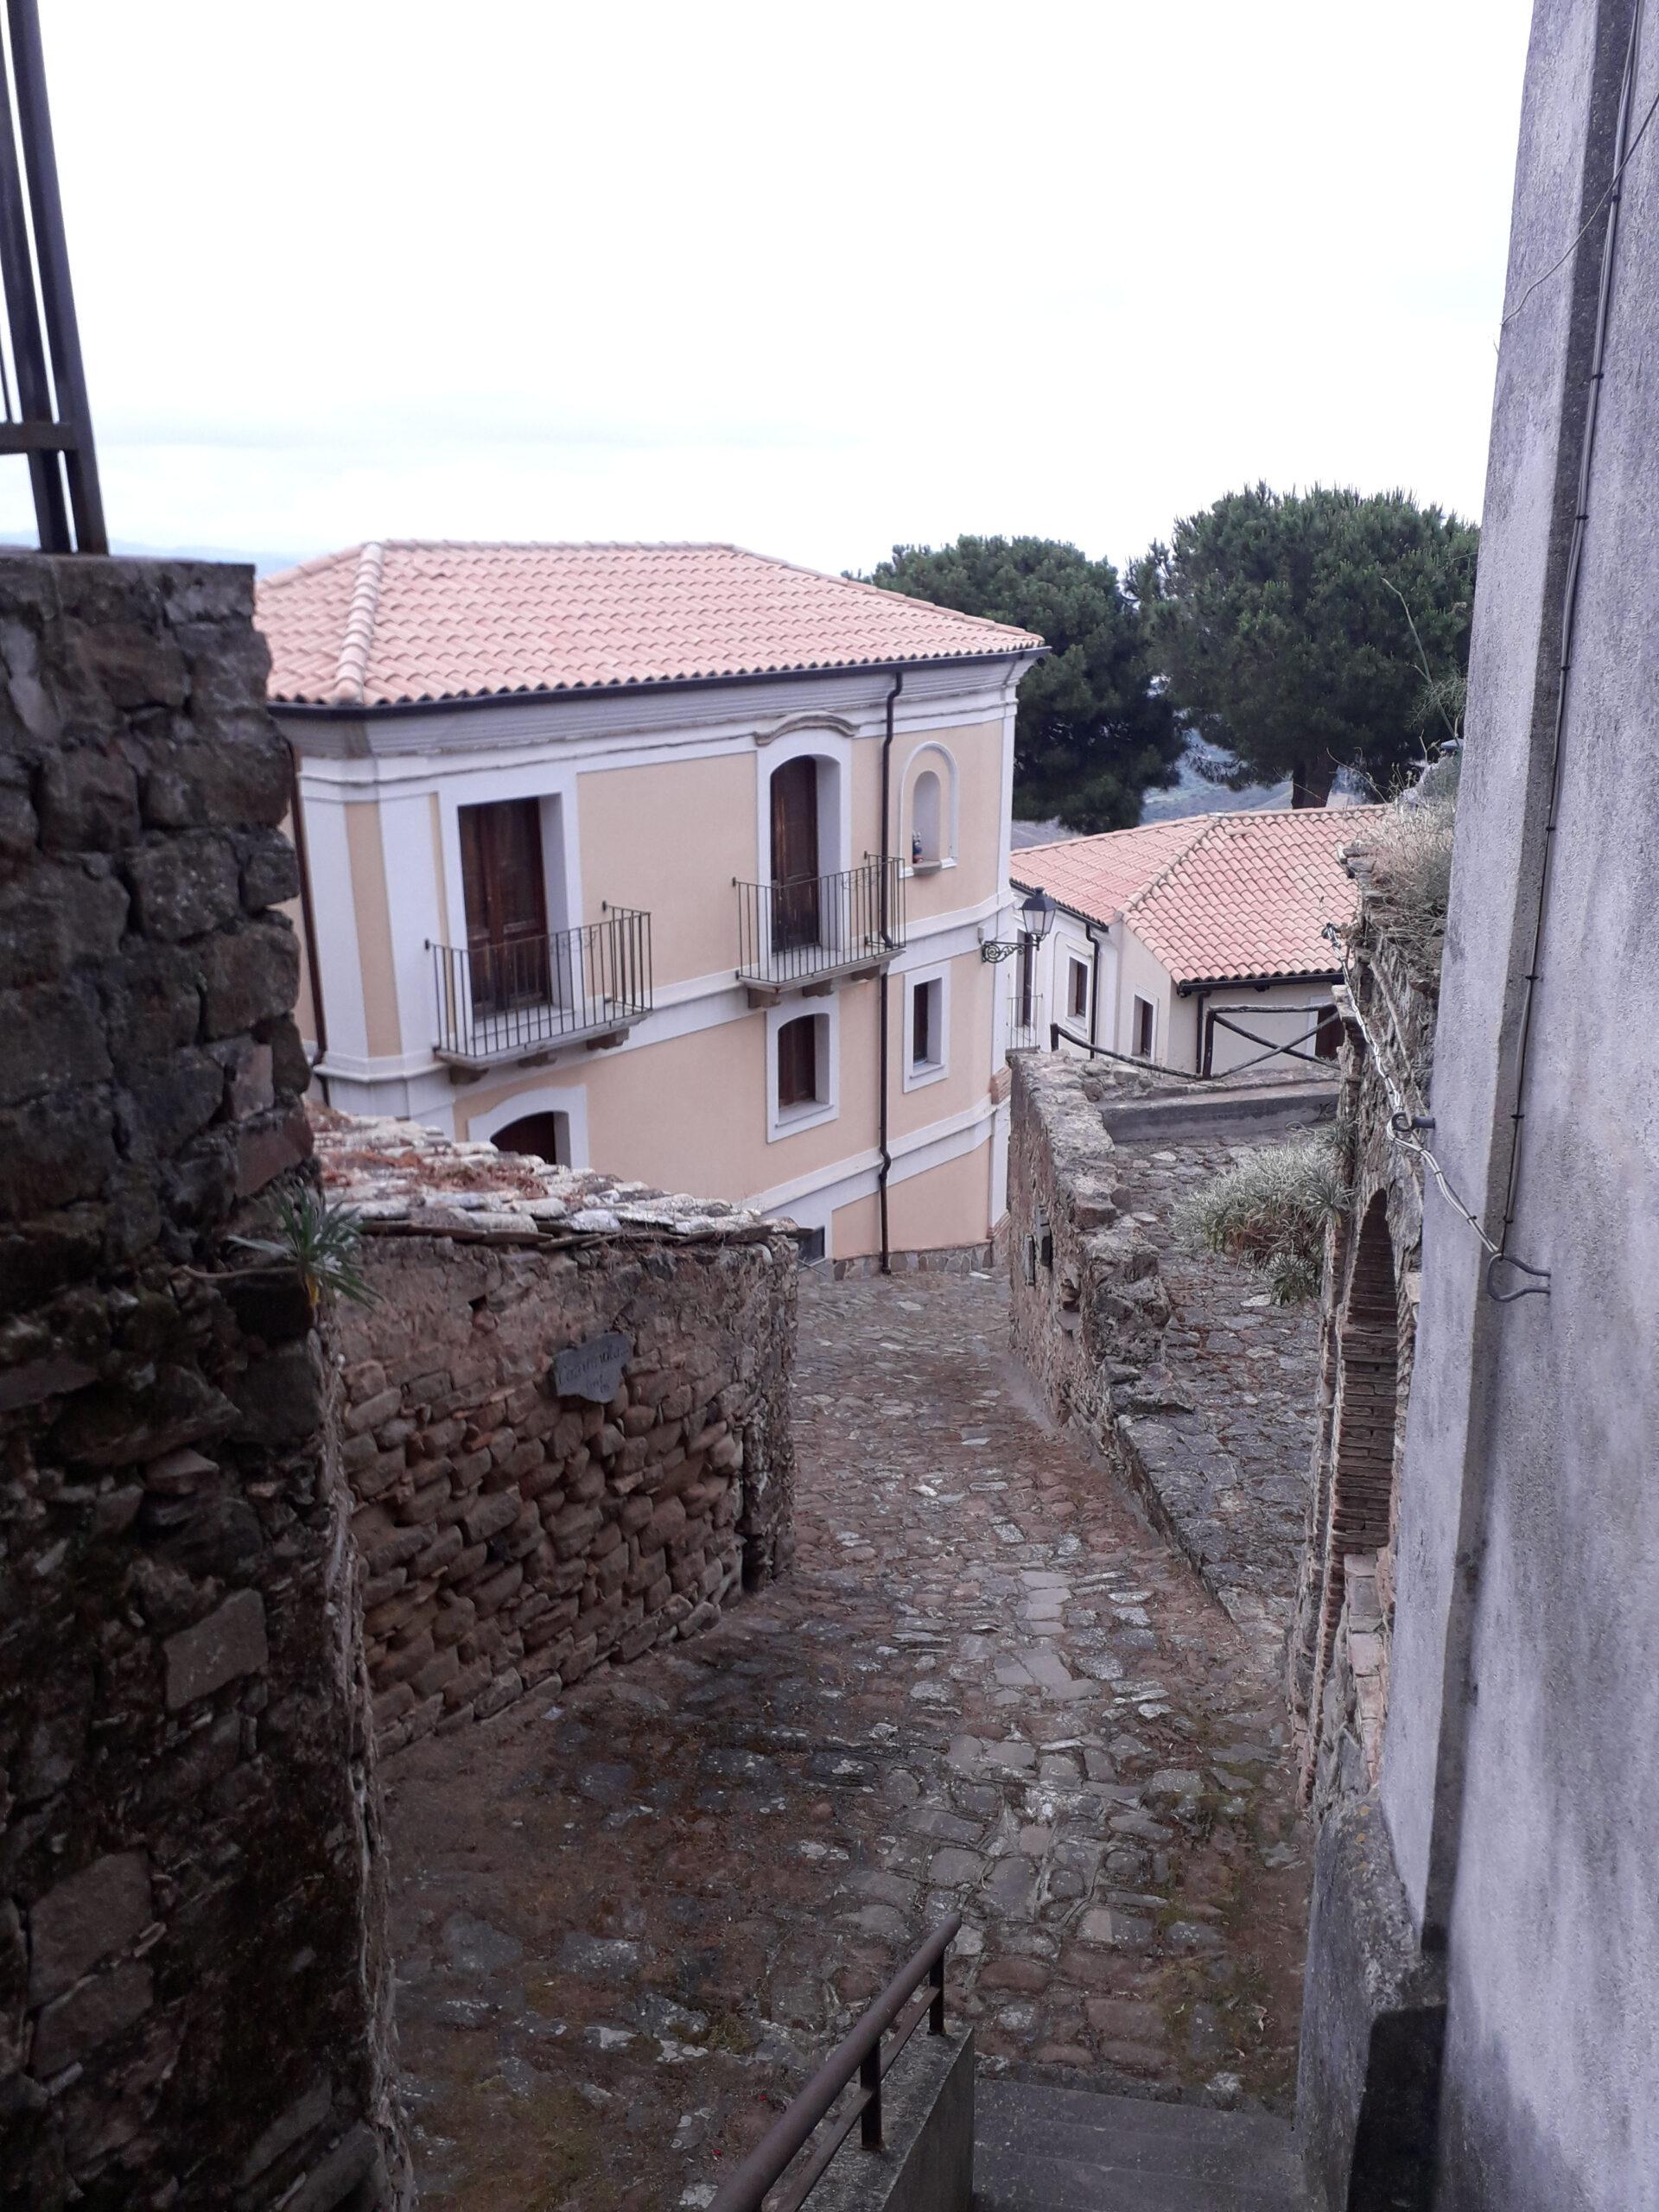 Borgo antico di Casignana